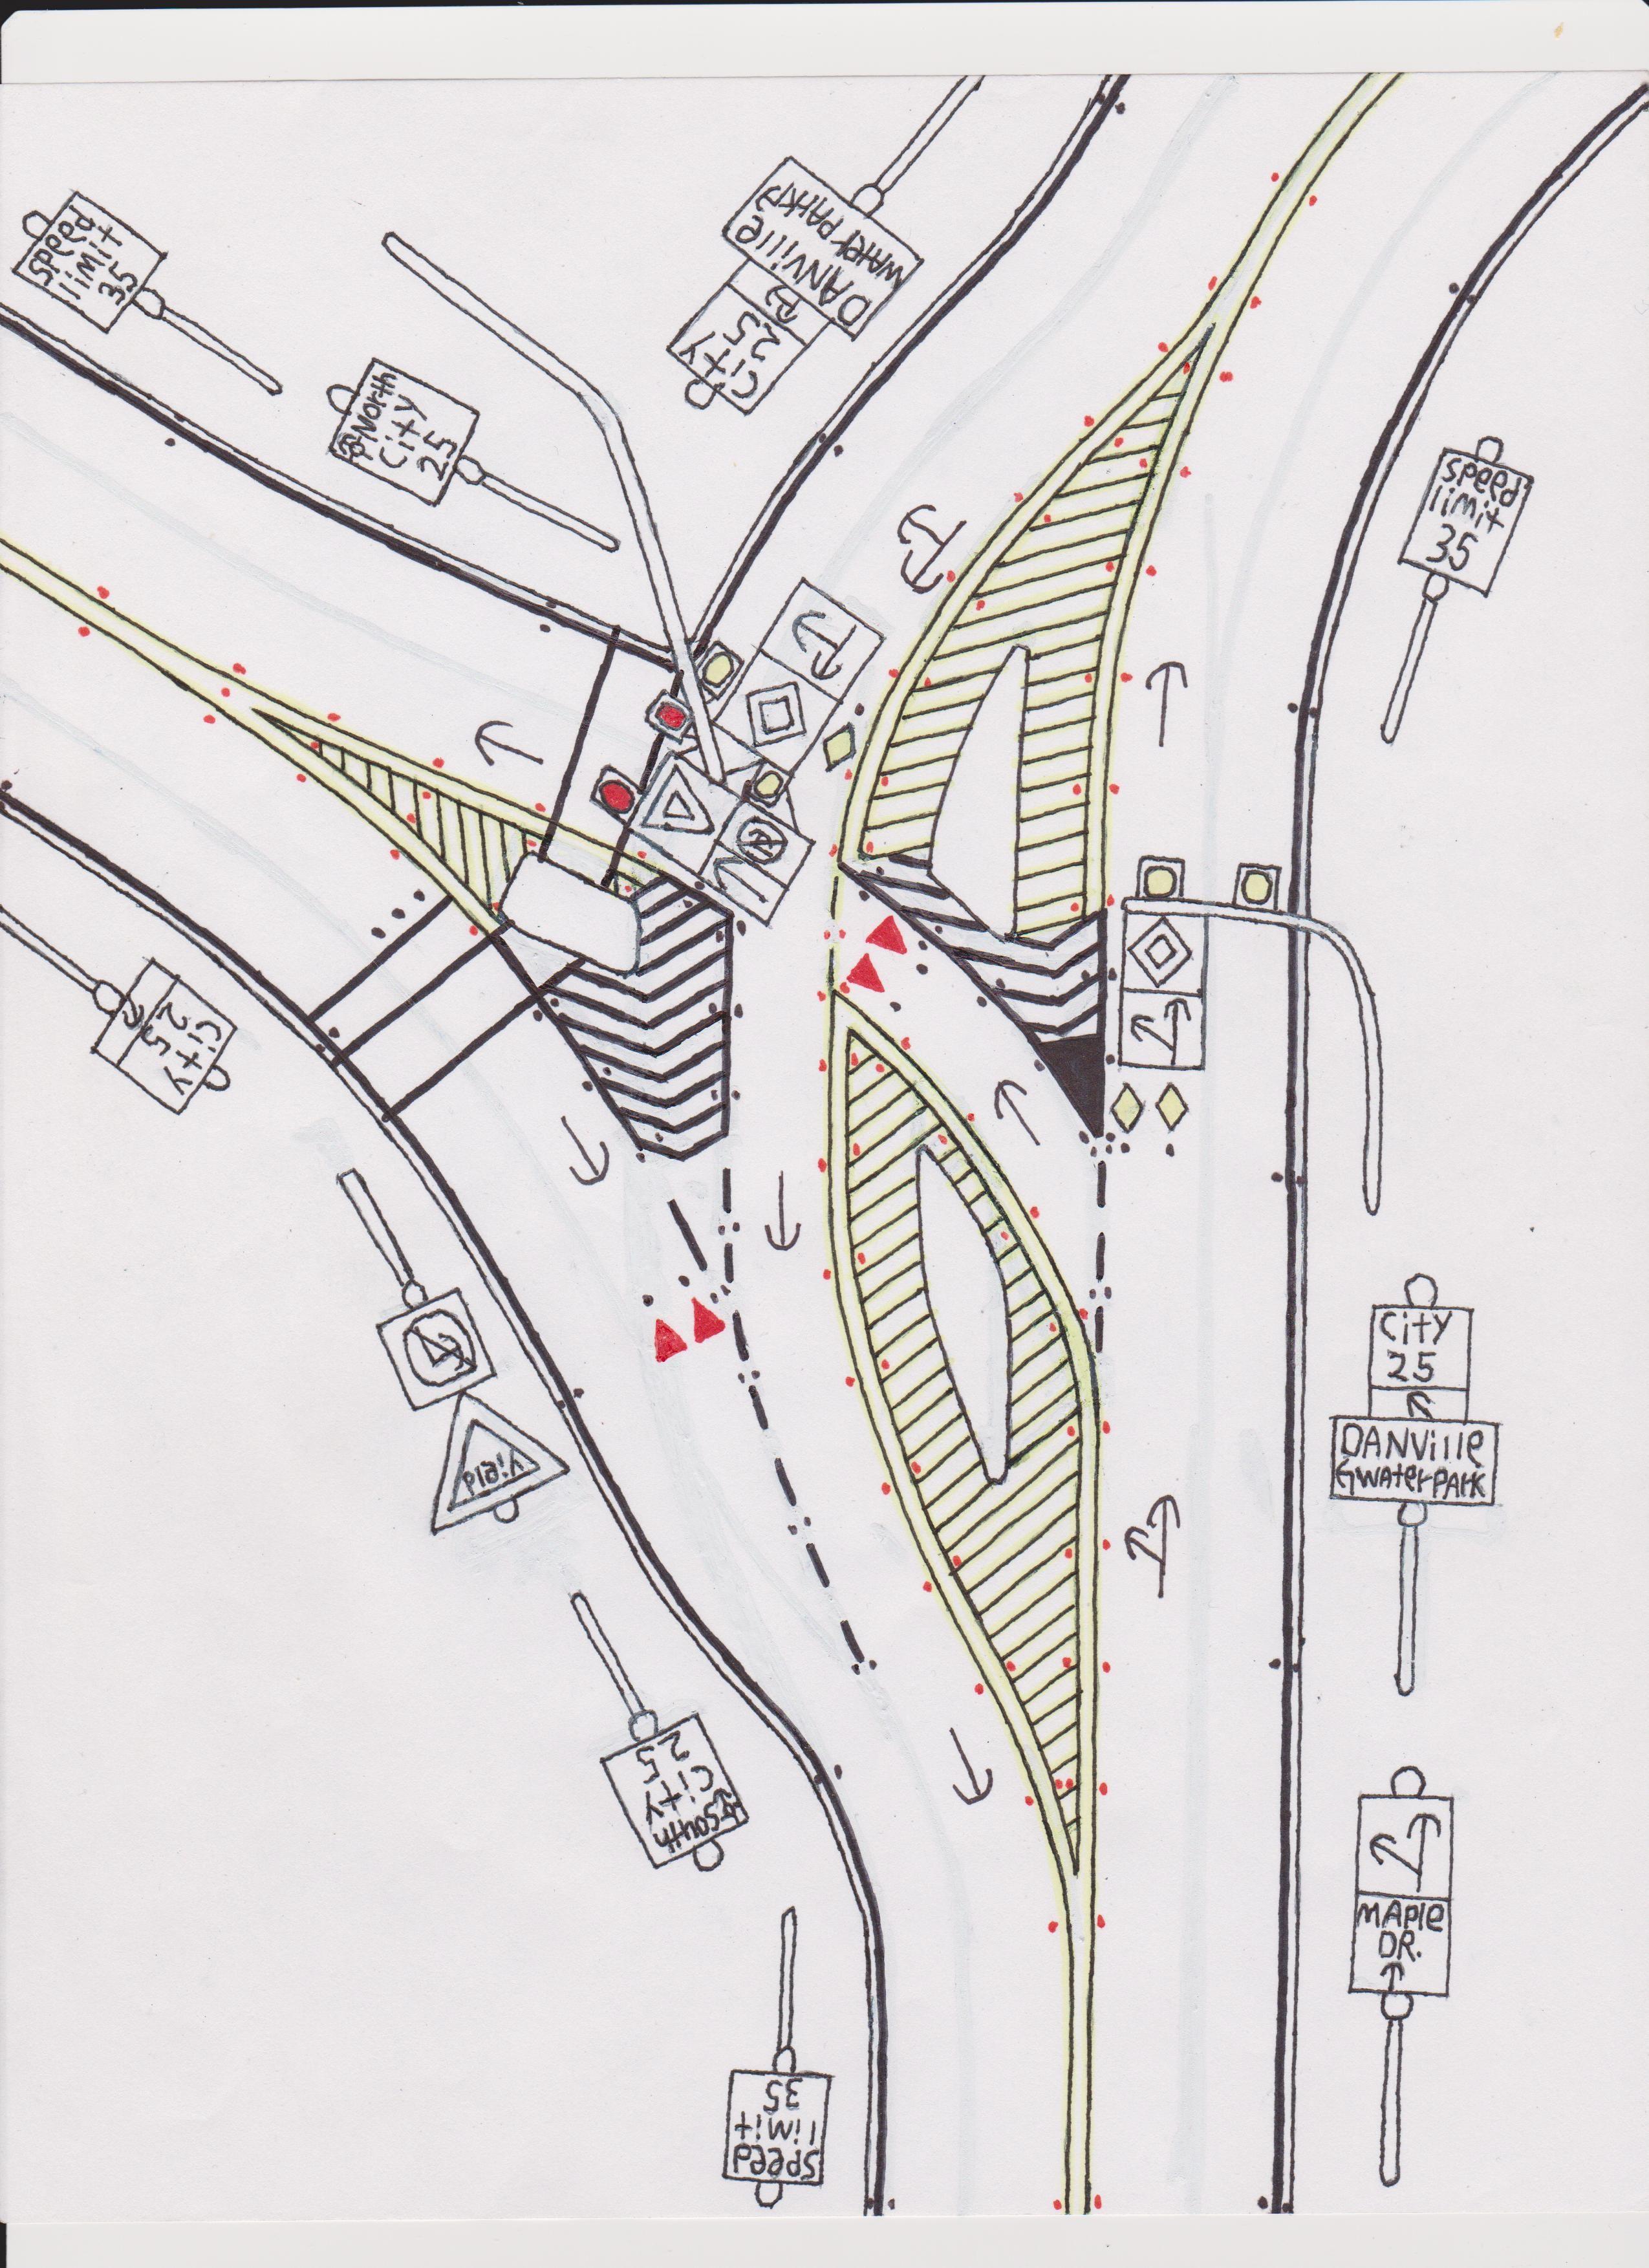 Road Drawings   Road Drawings Stuff   Pinterest   Drawing ...